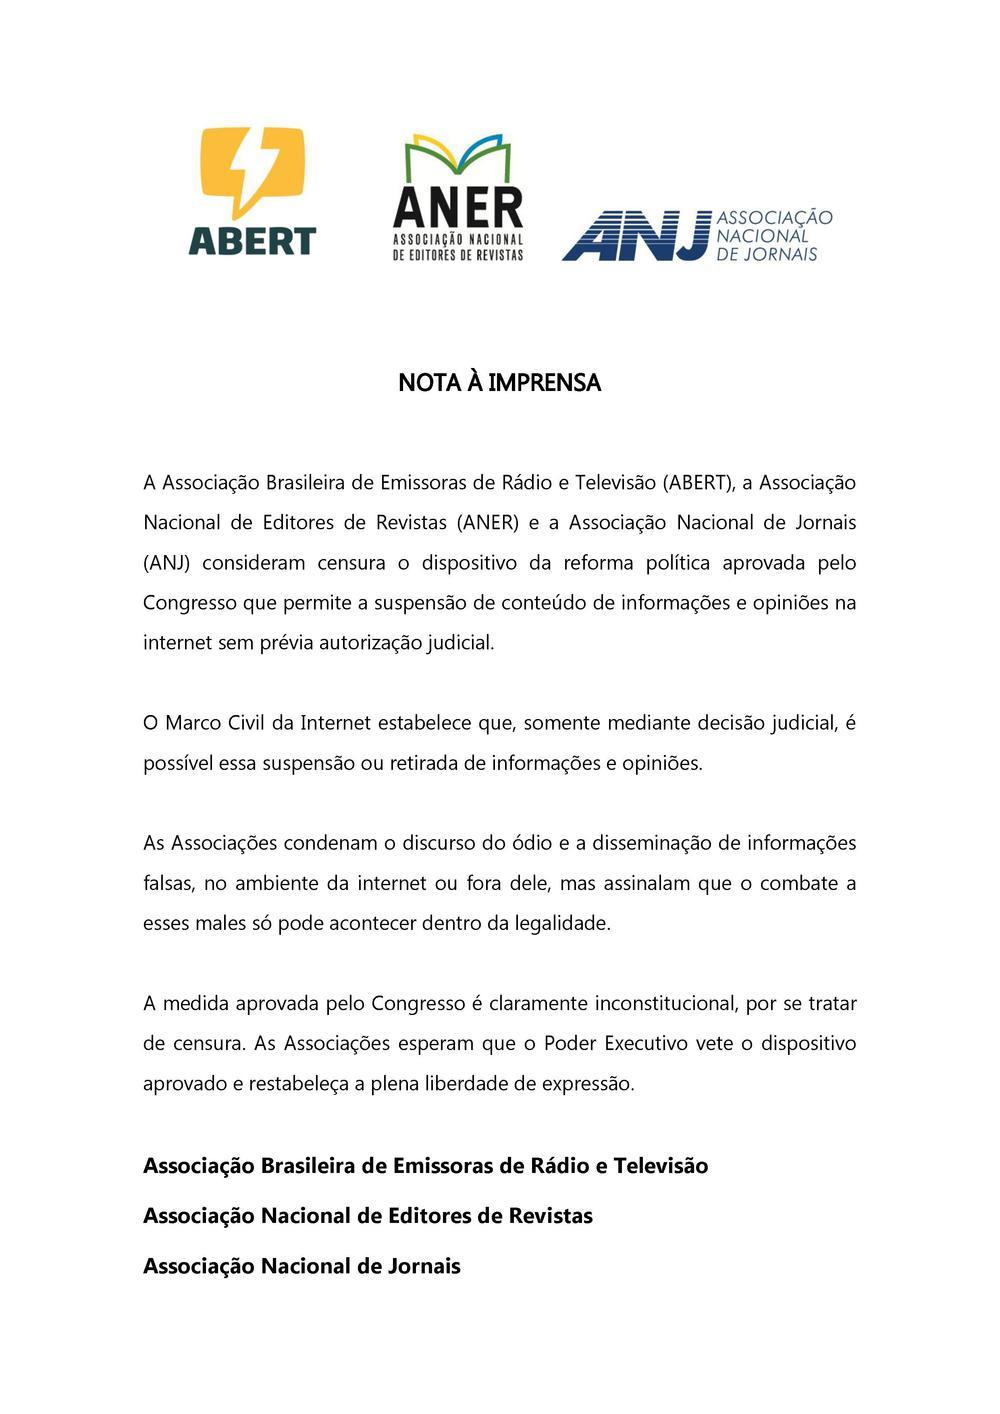 nota-a-imprensa_-_05.10